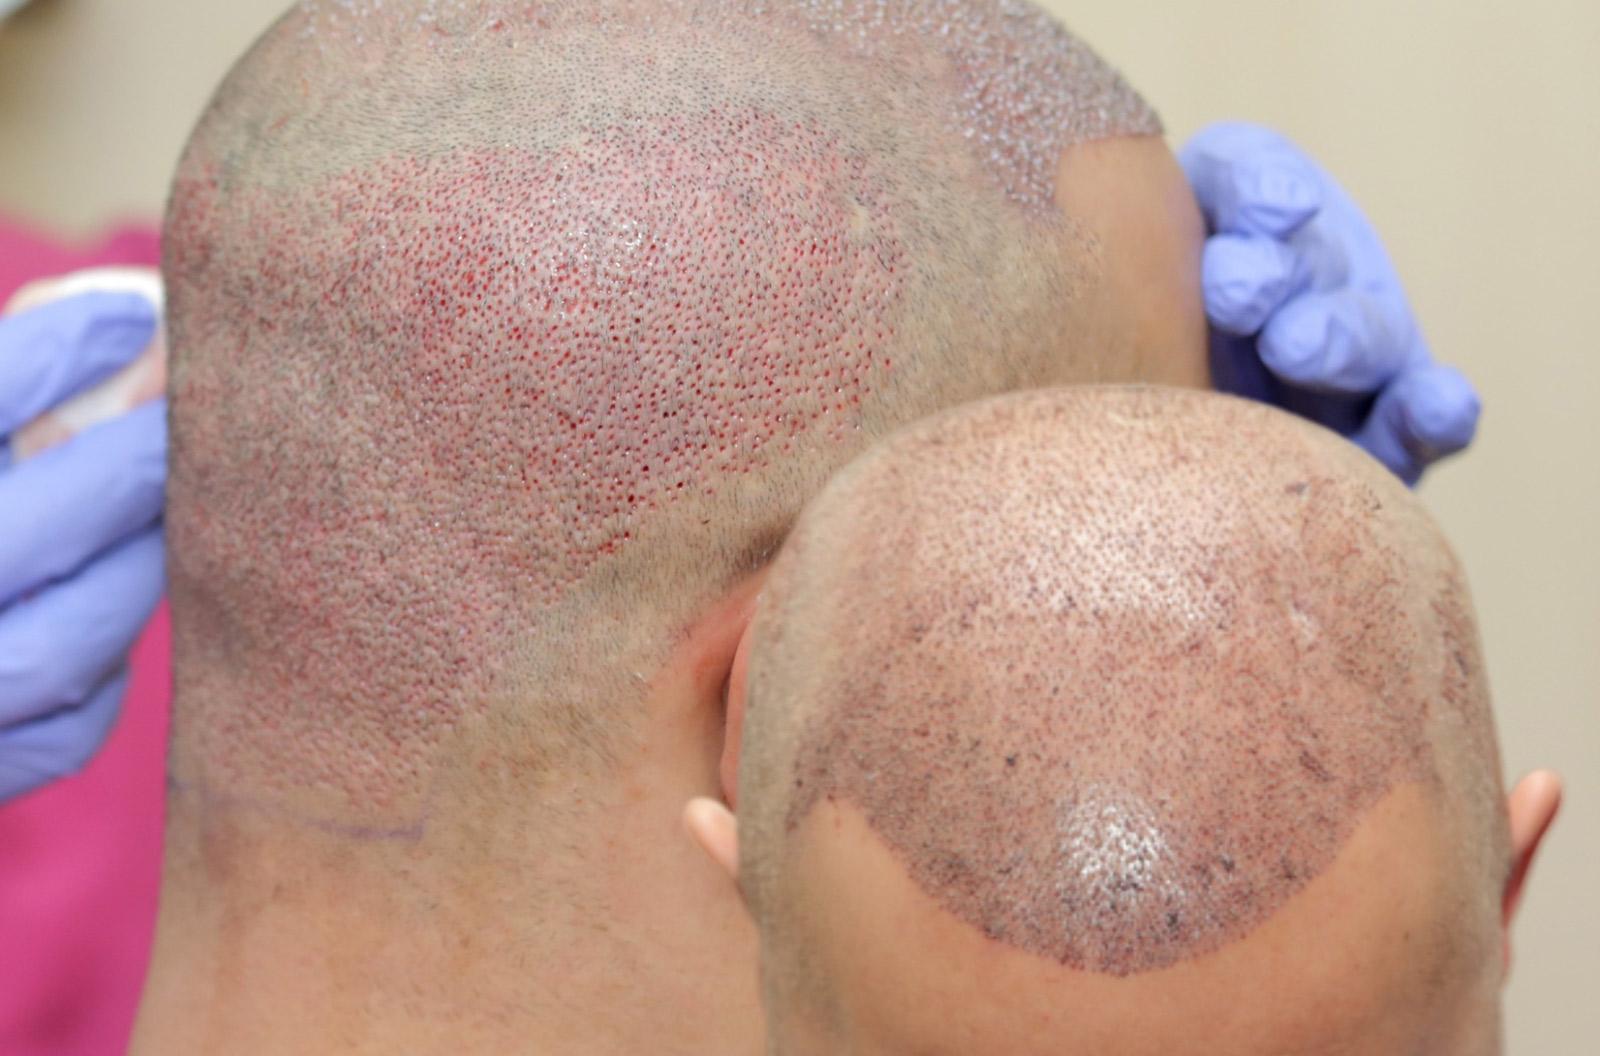 FUE Haartransplantation - Das Ergebnis